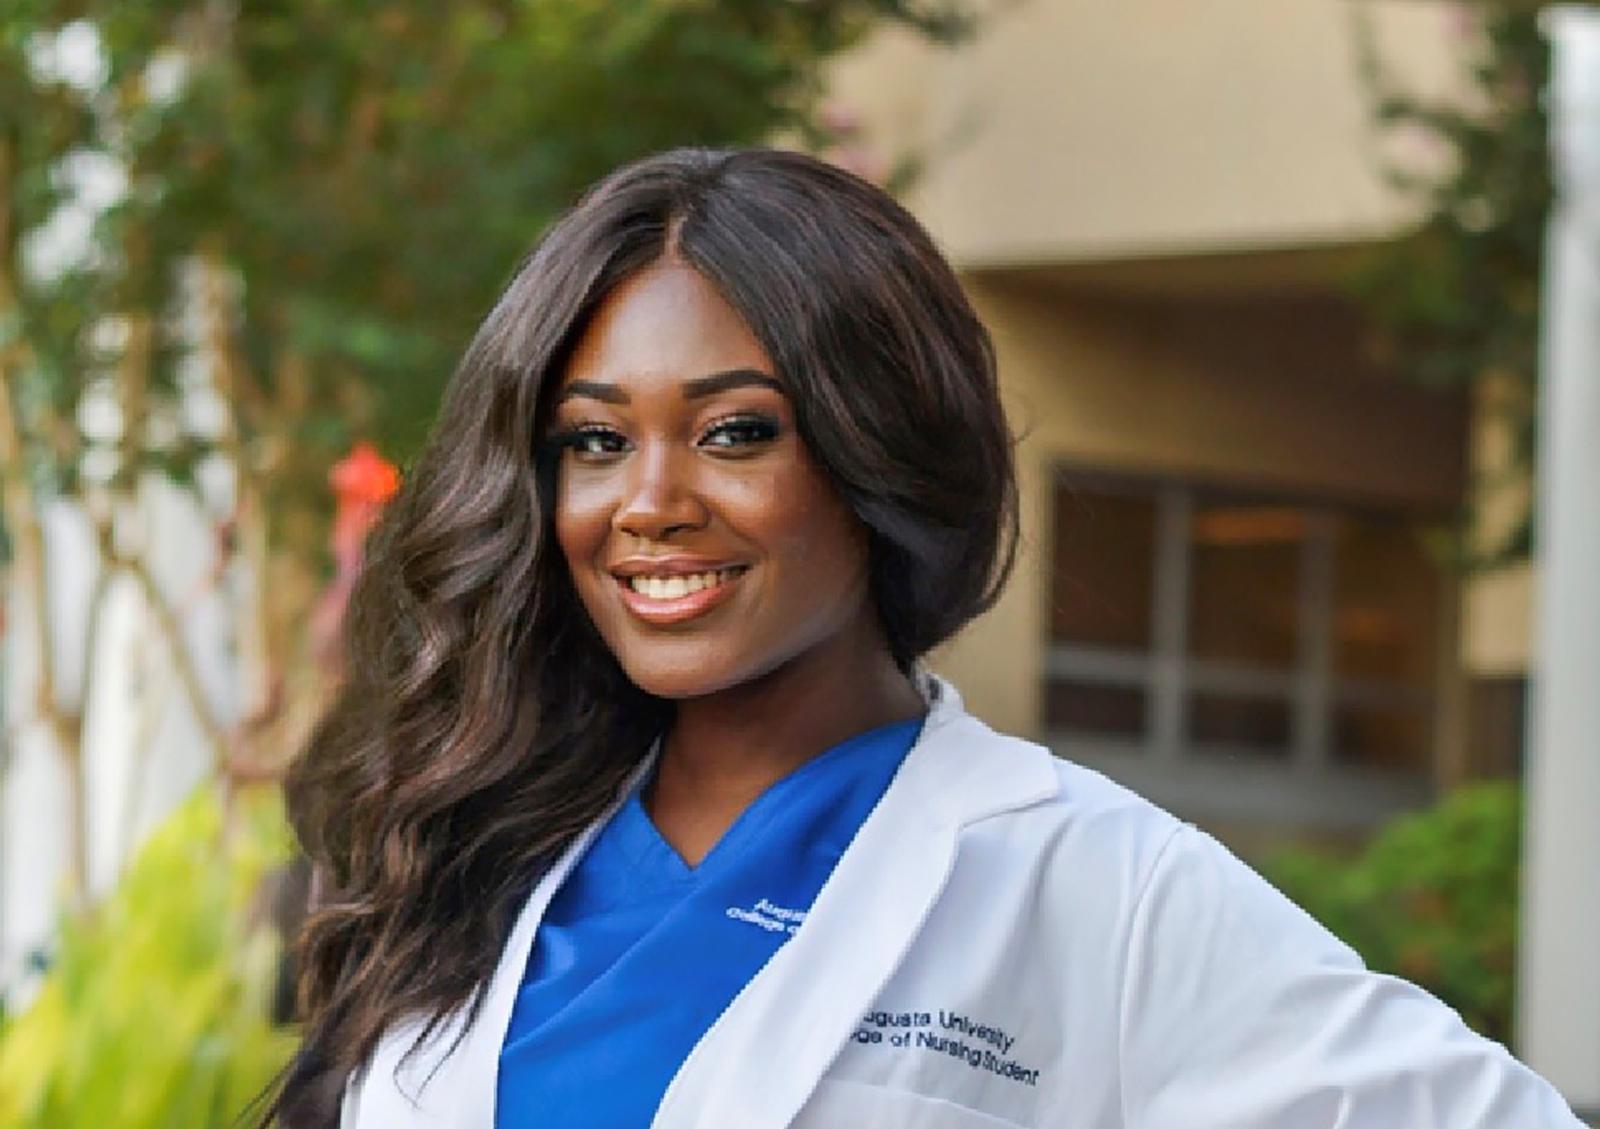 Nursing student in white coat